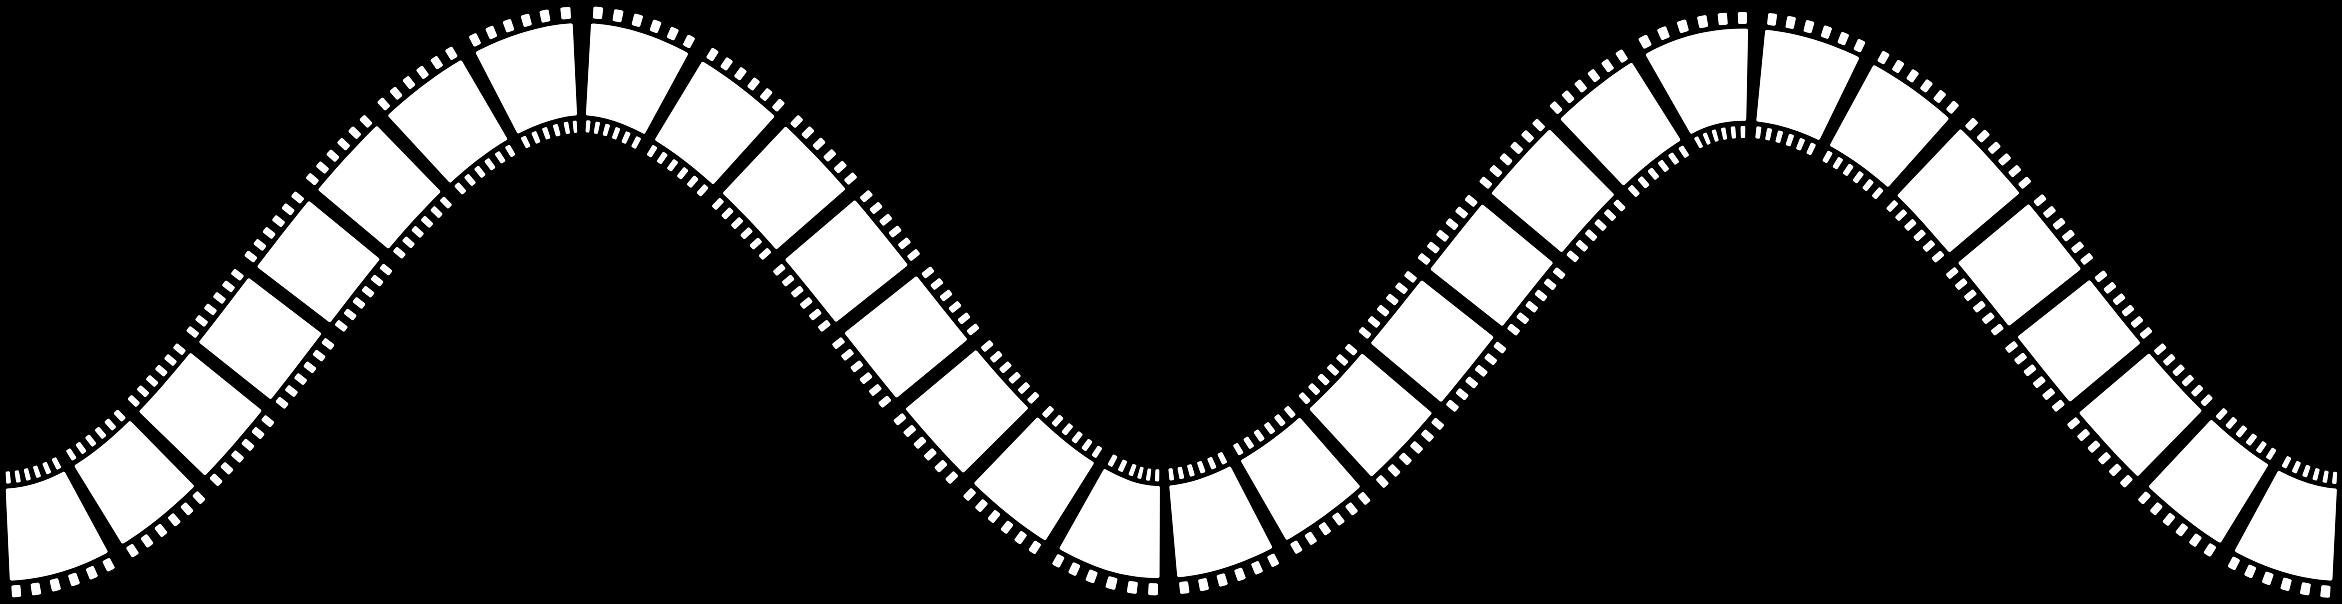 Film clipart wavy. Strip big image png